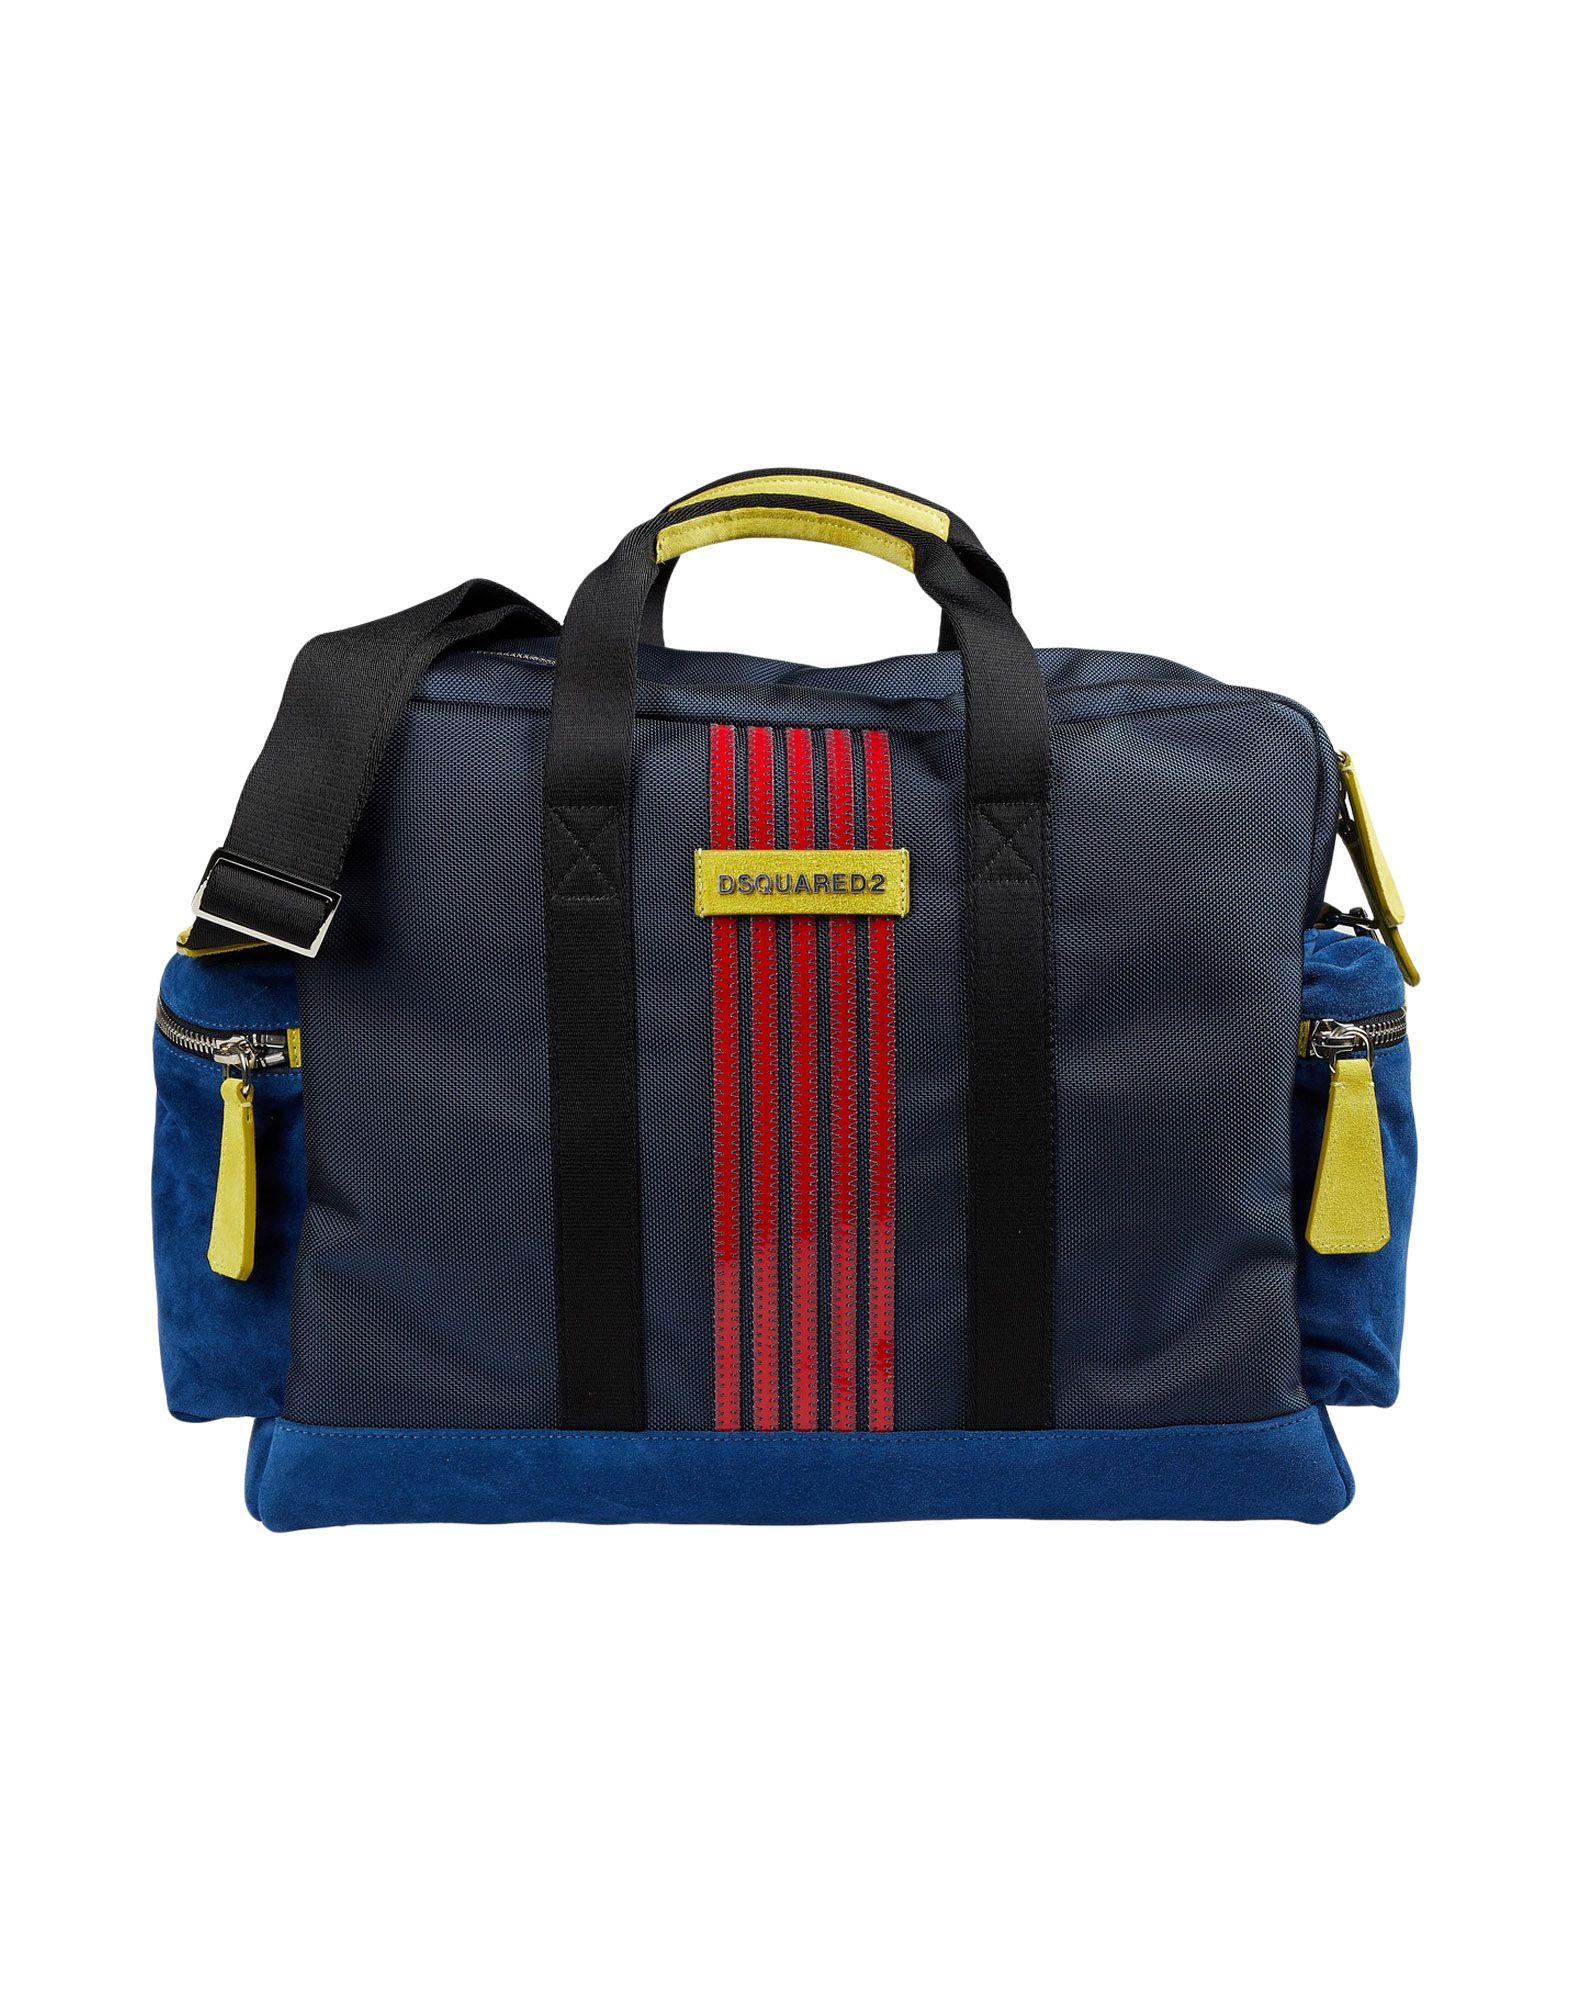 DSQUARED2 Деловые сумки женские сумки